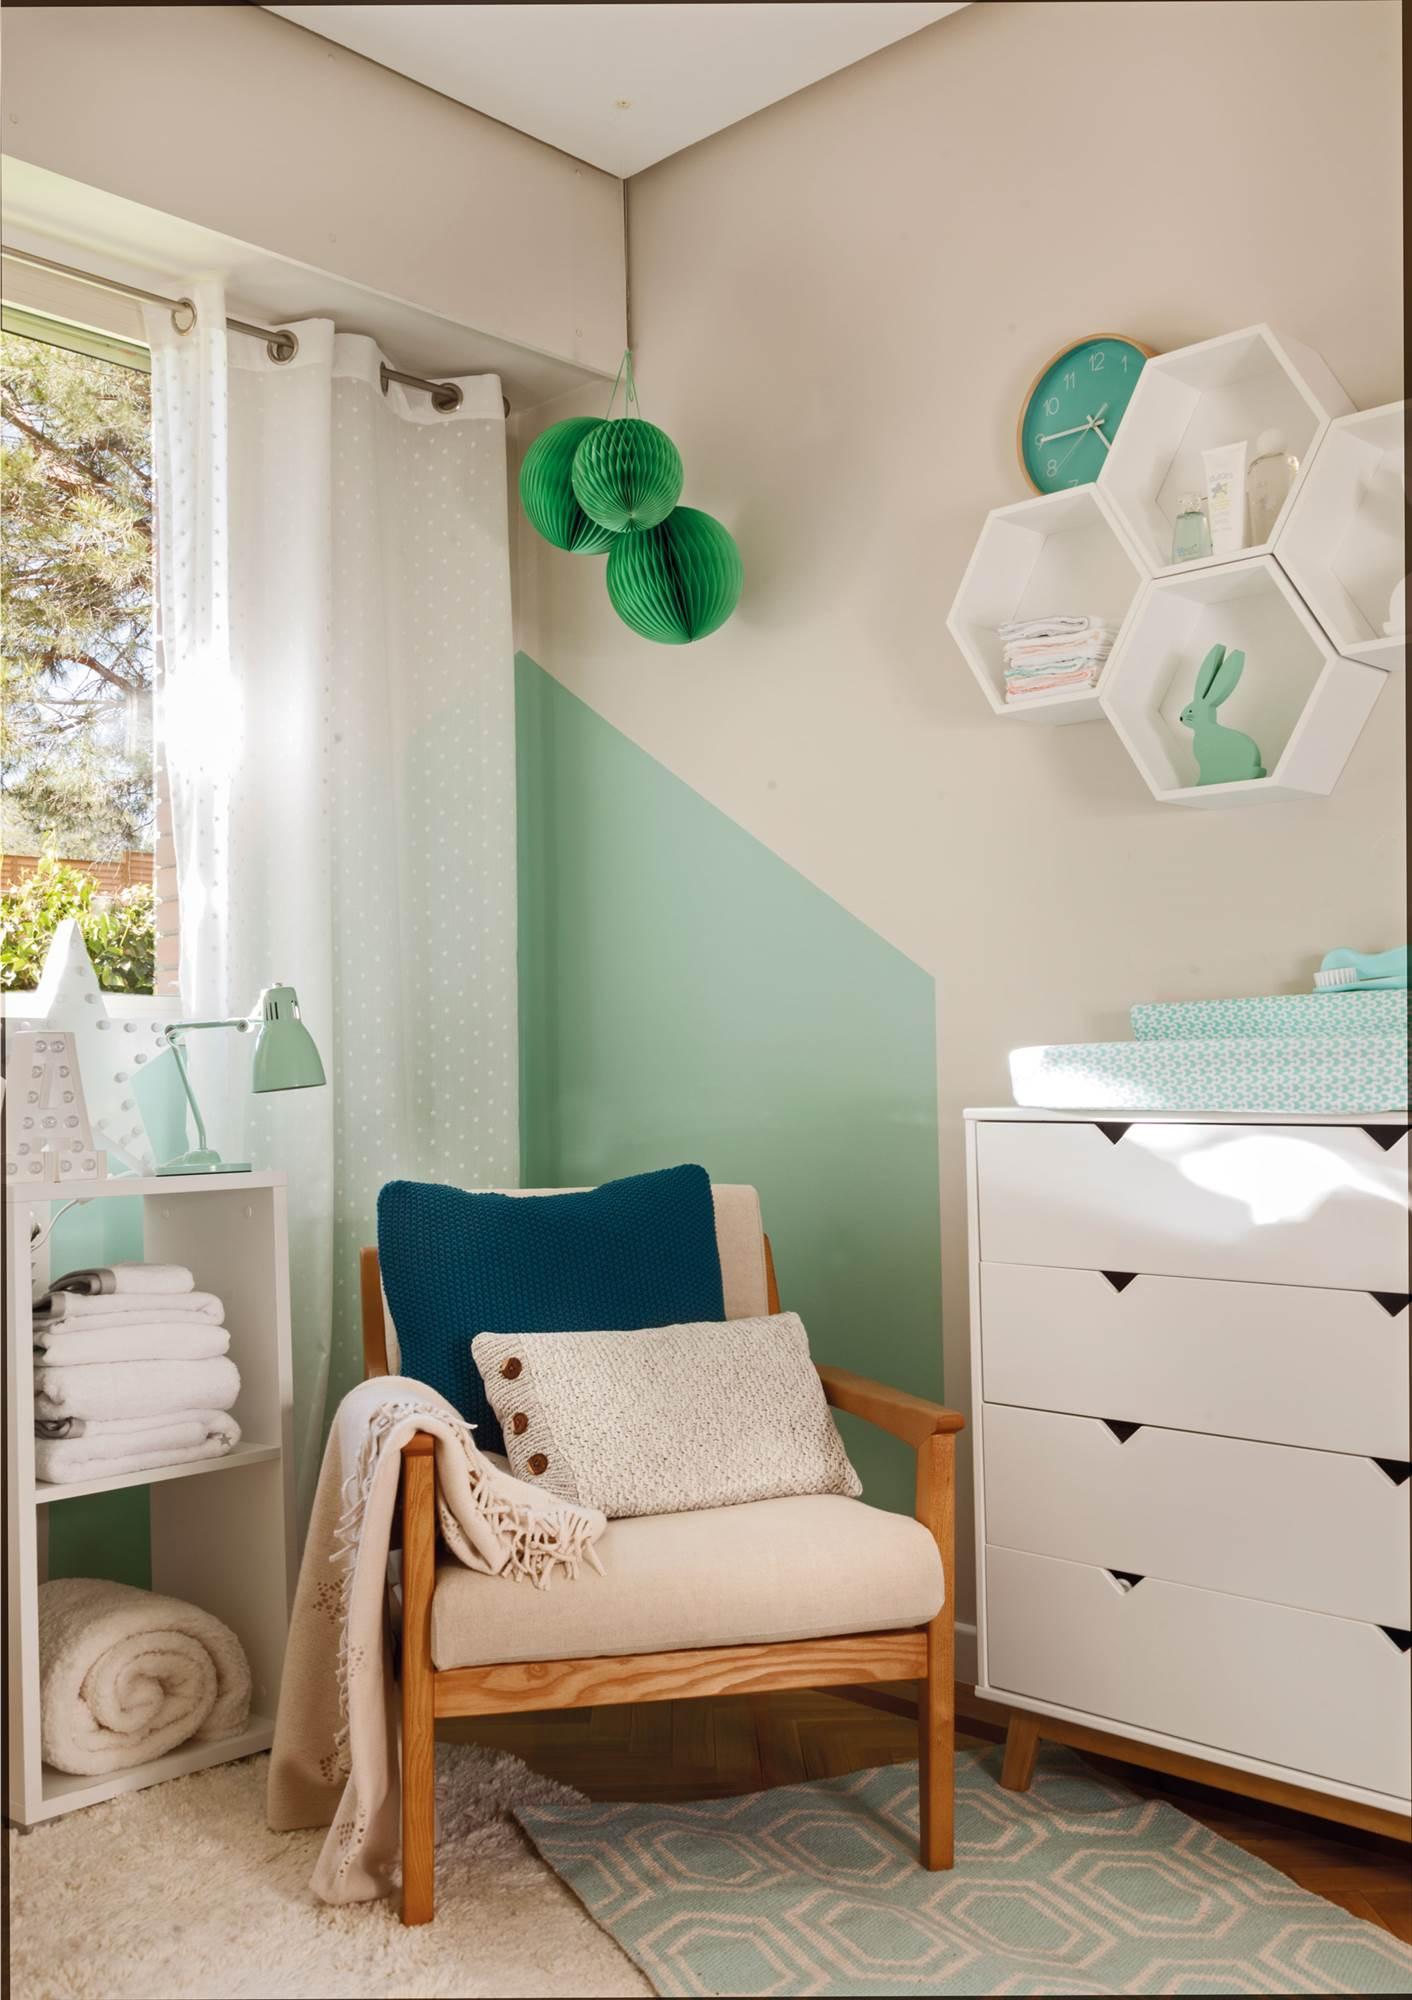 ideas para pintar habitacion infantil Pintar Dormitorio Infantil